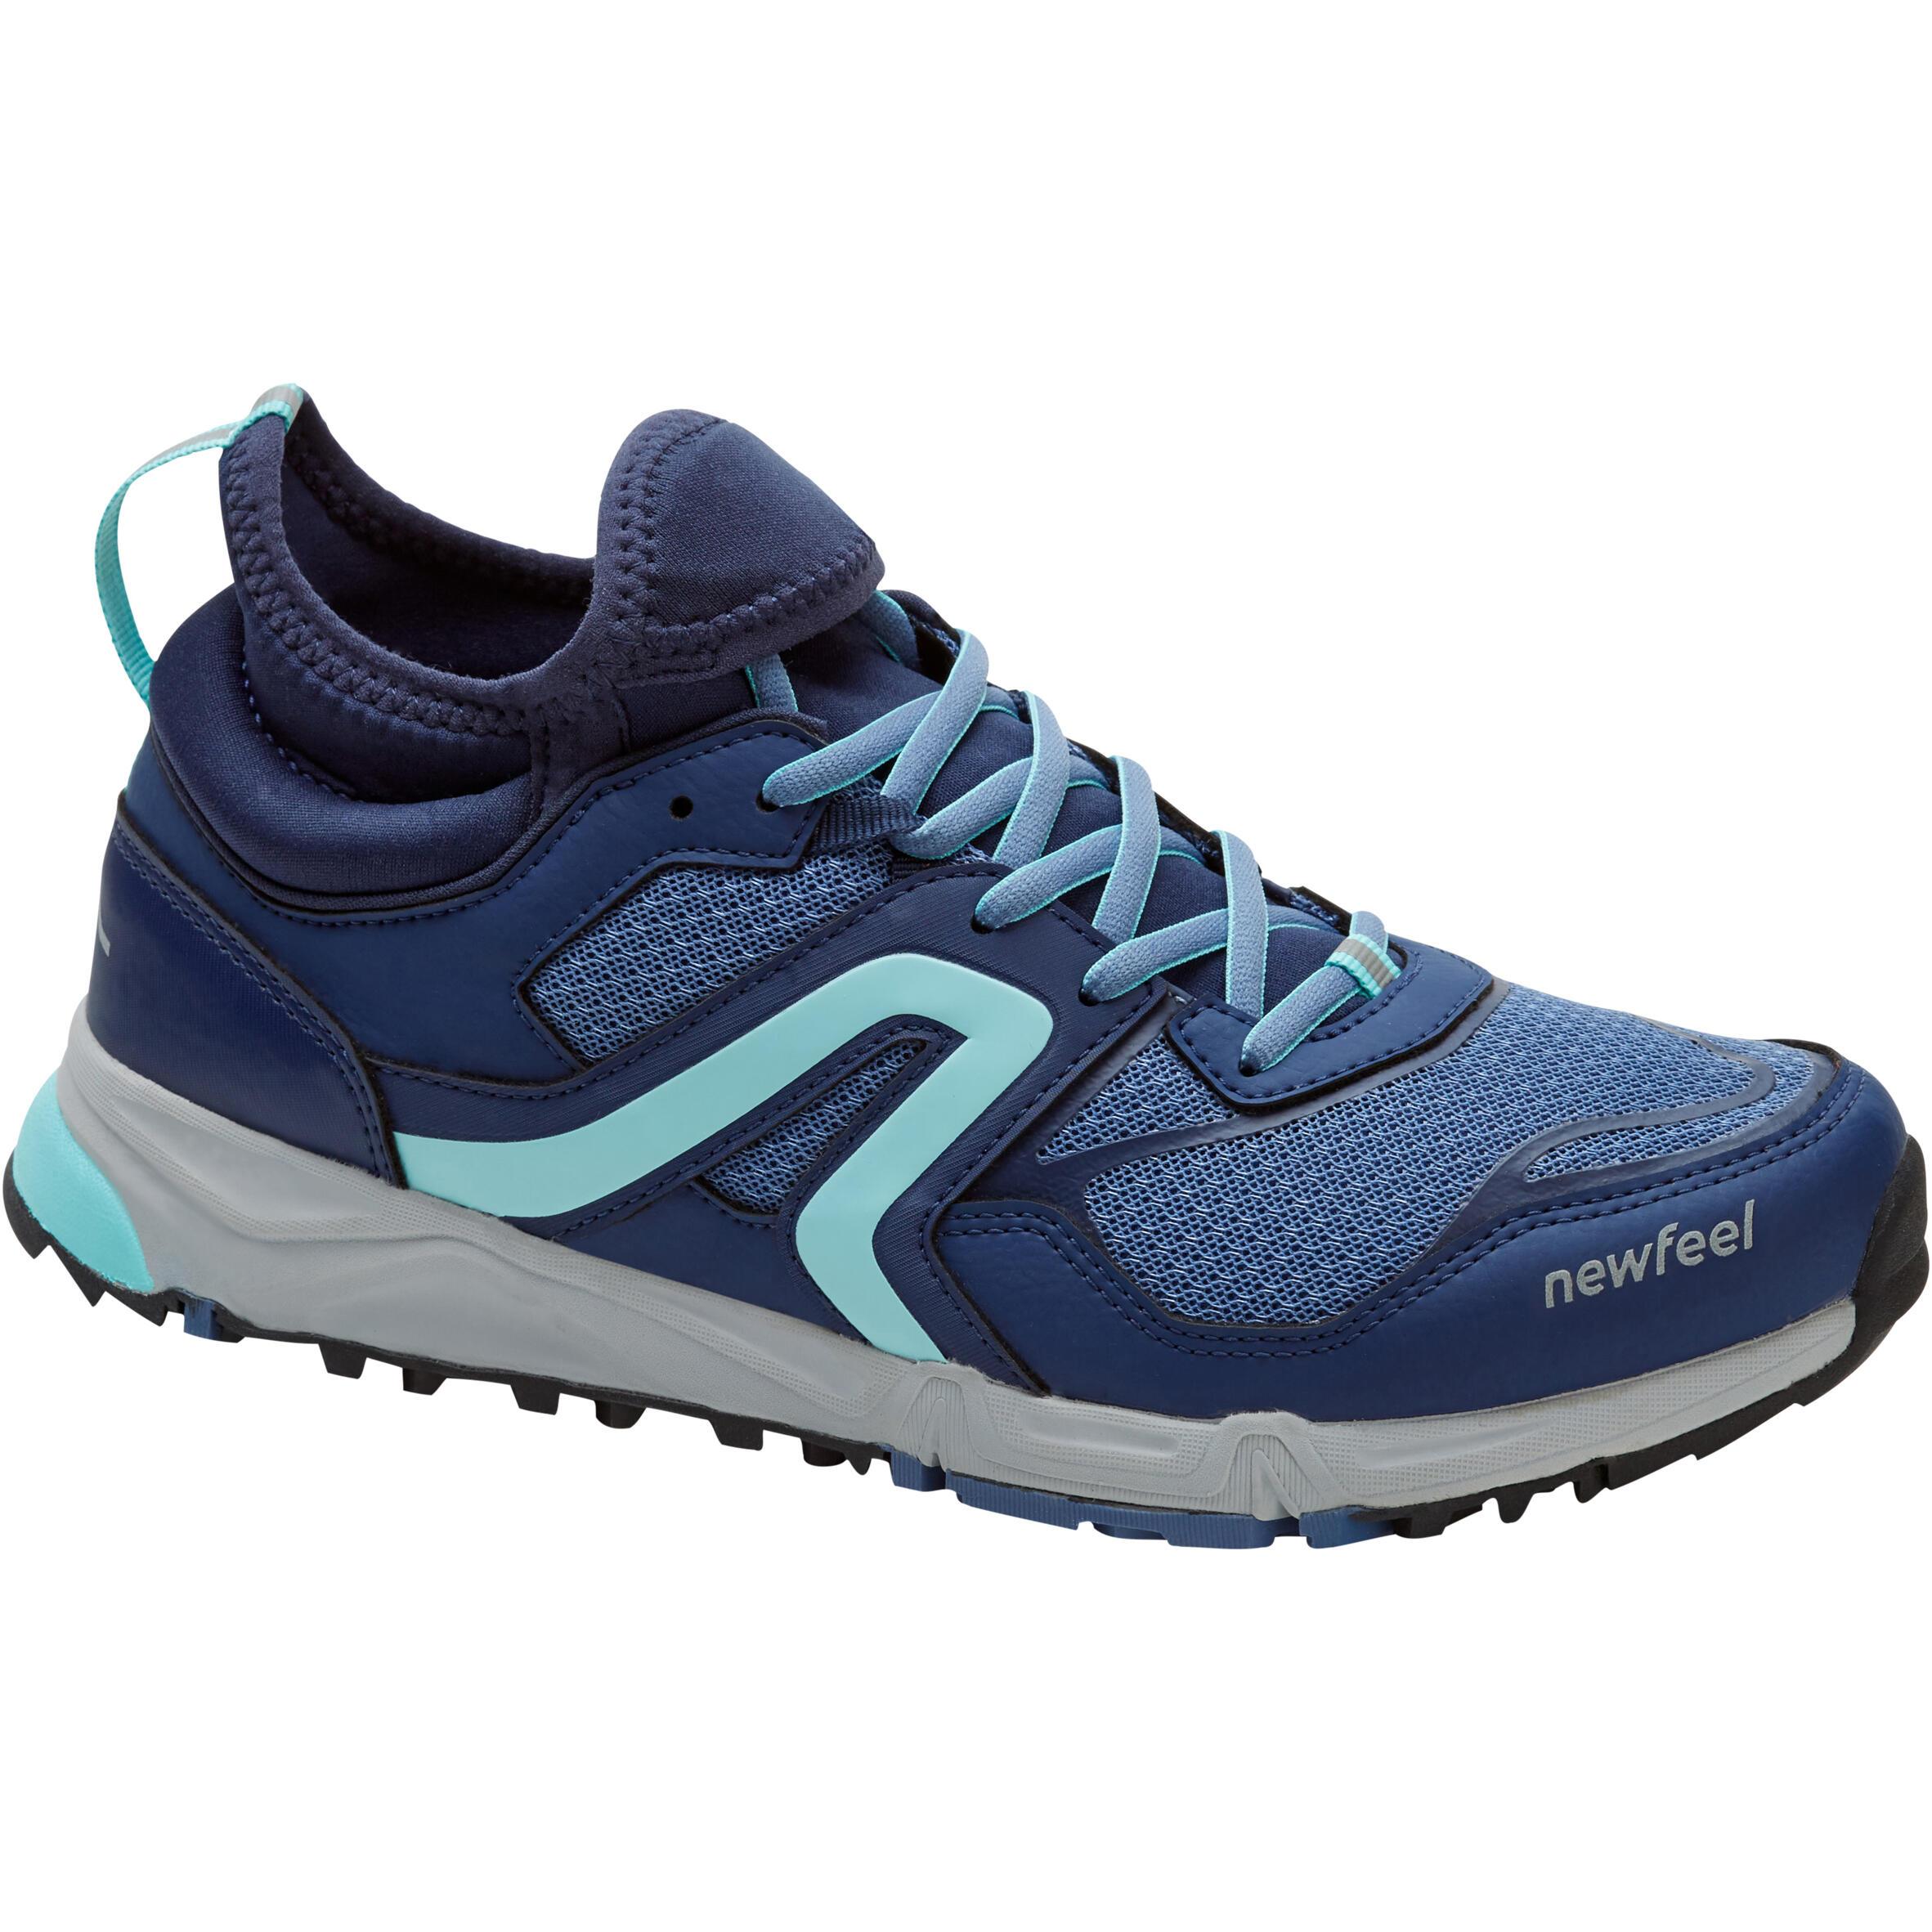 Newfeel Chaussures de marche nordique femme NW 500 Flex-H bleu - Newfeel